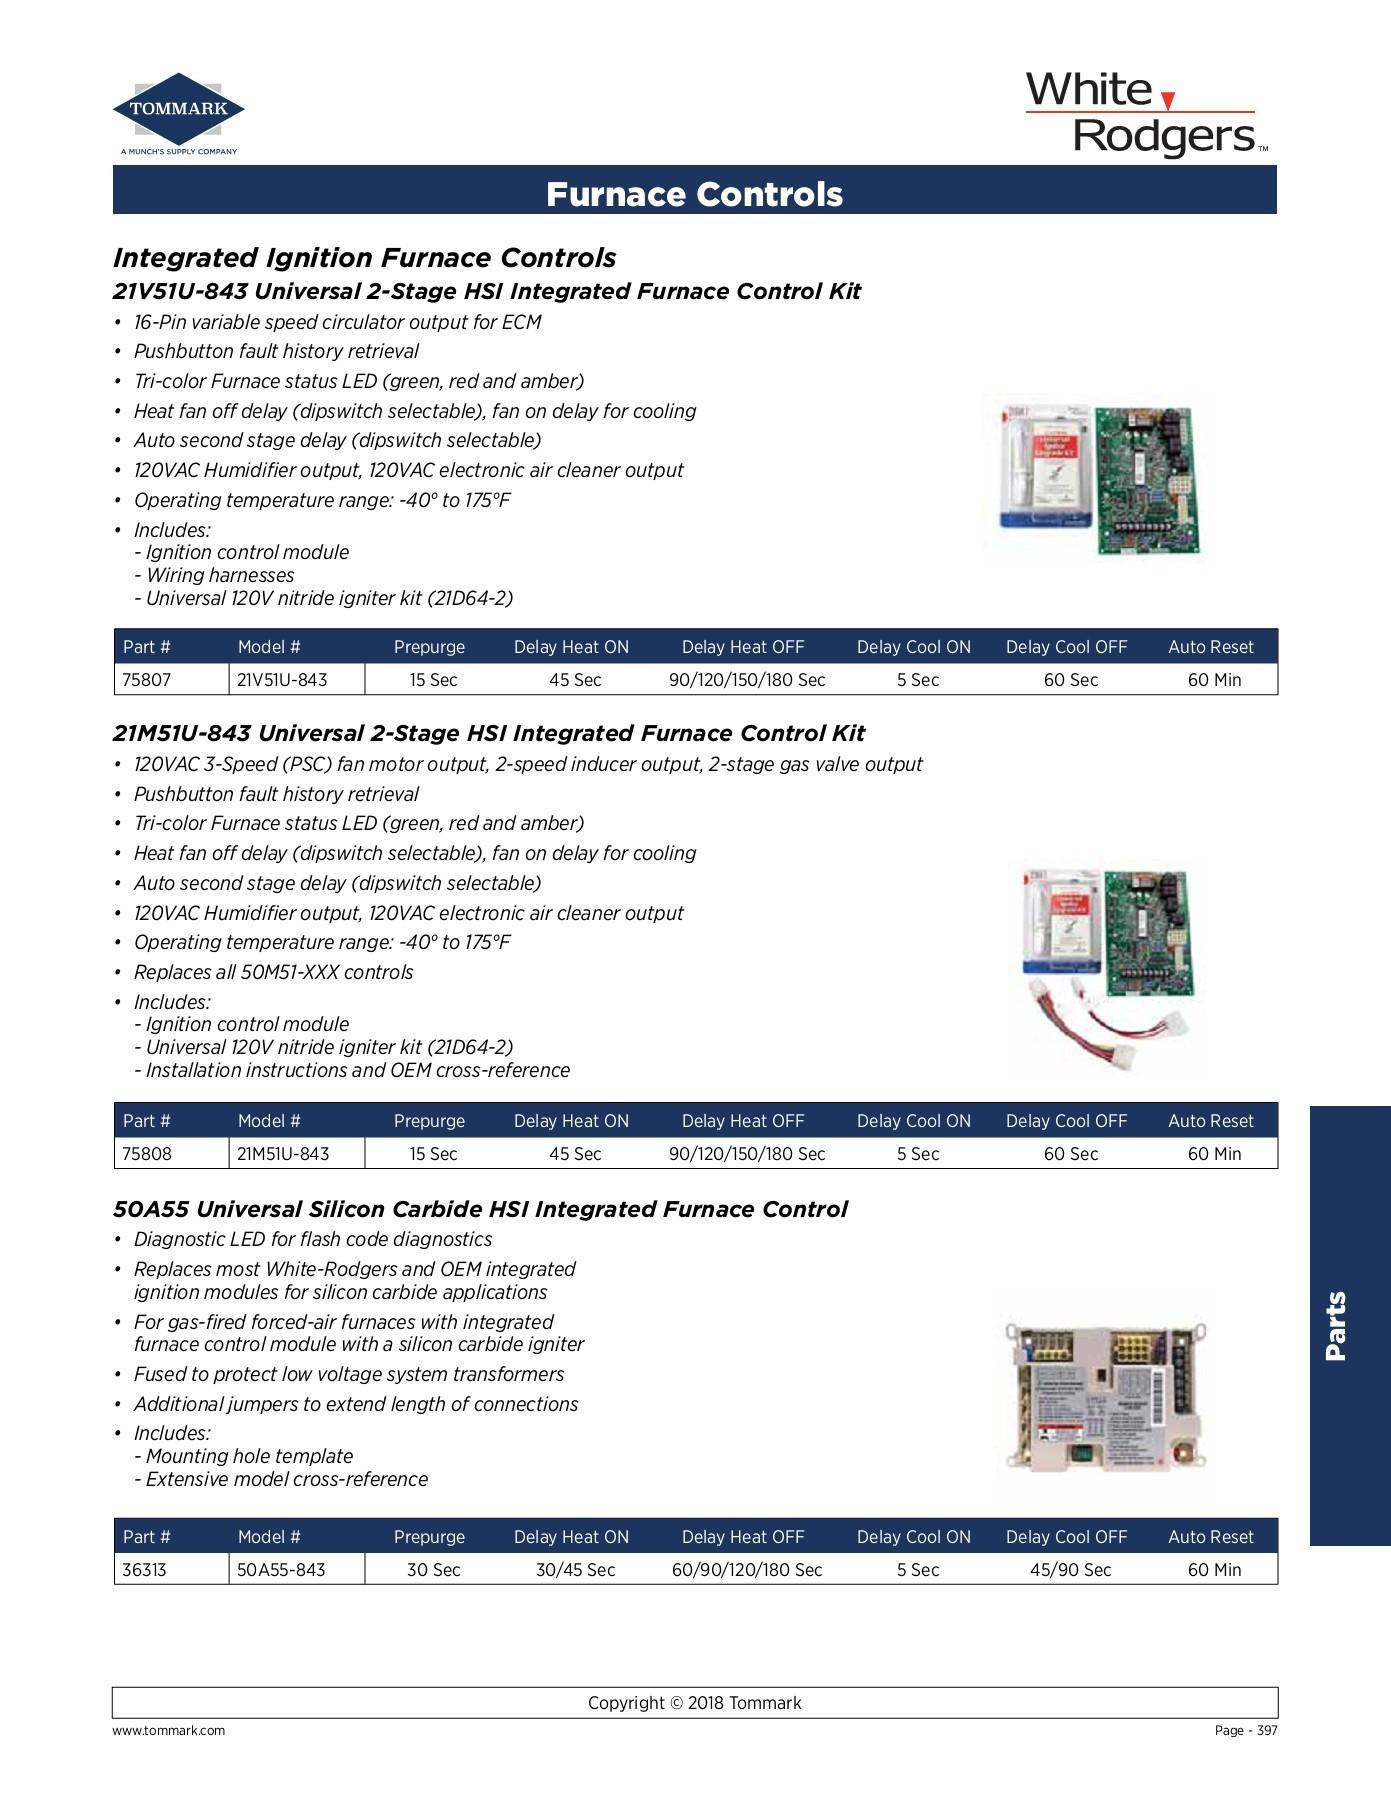 06708 1118 tommark trane catalog pages 401 450 text version fliphtml5 [ 1391 x 1800 Pixel ]